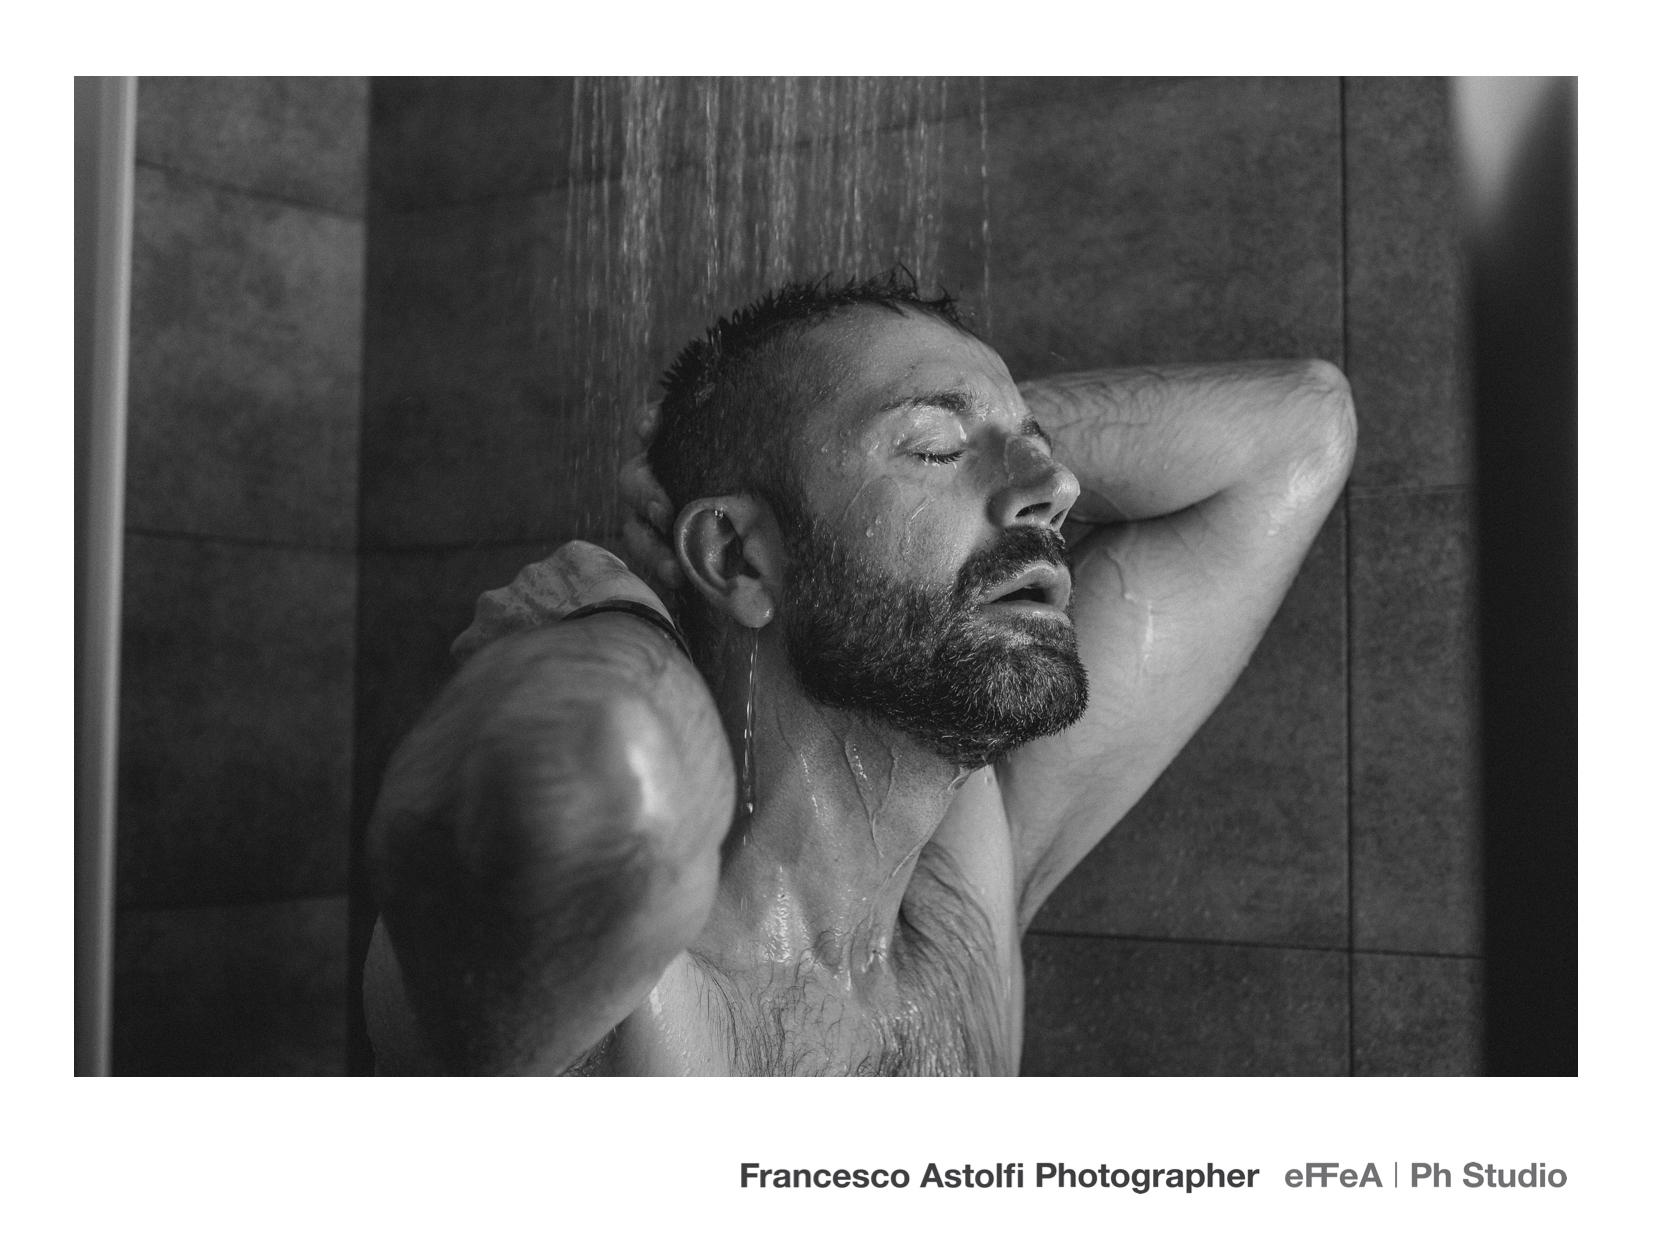 006 - ANDREA S. - Photo by Francesco Astolfi